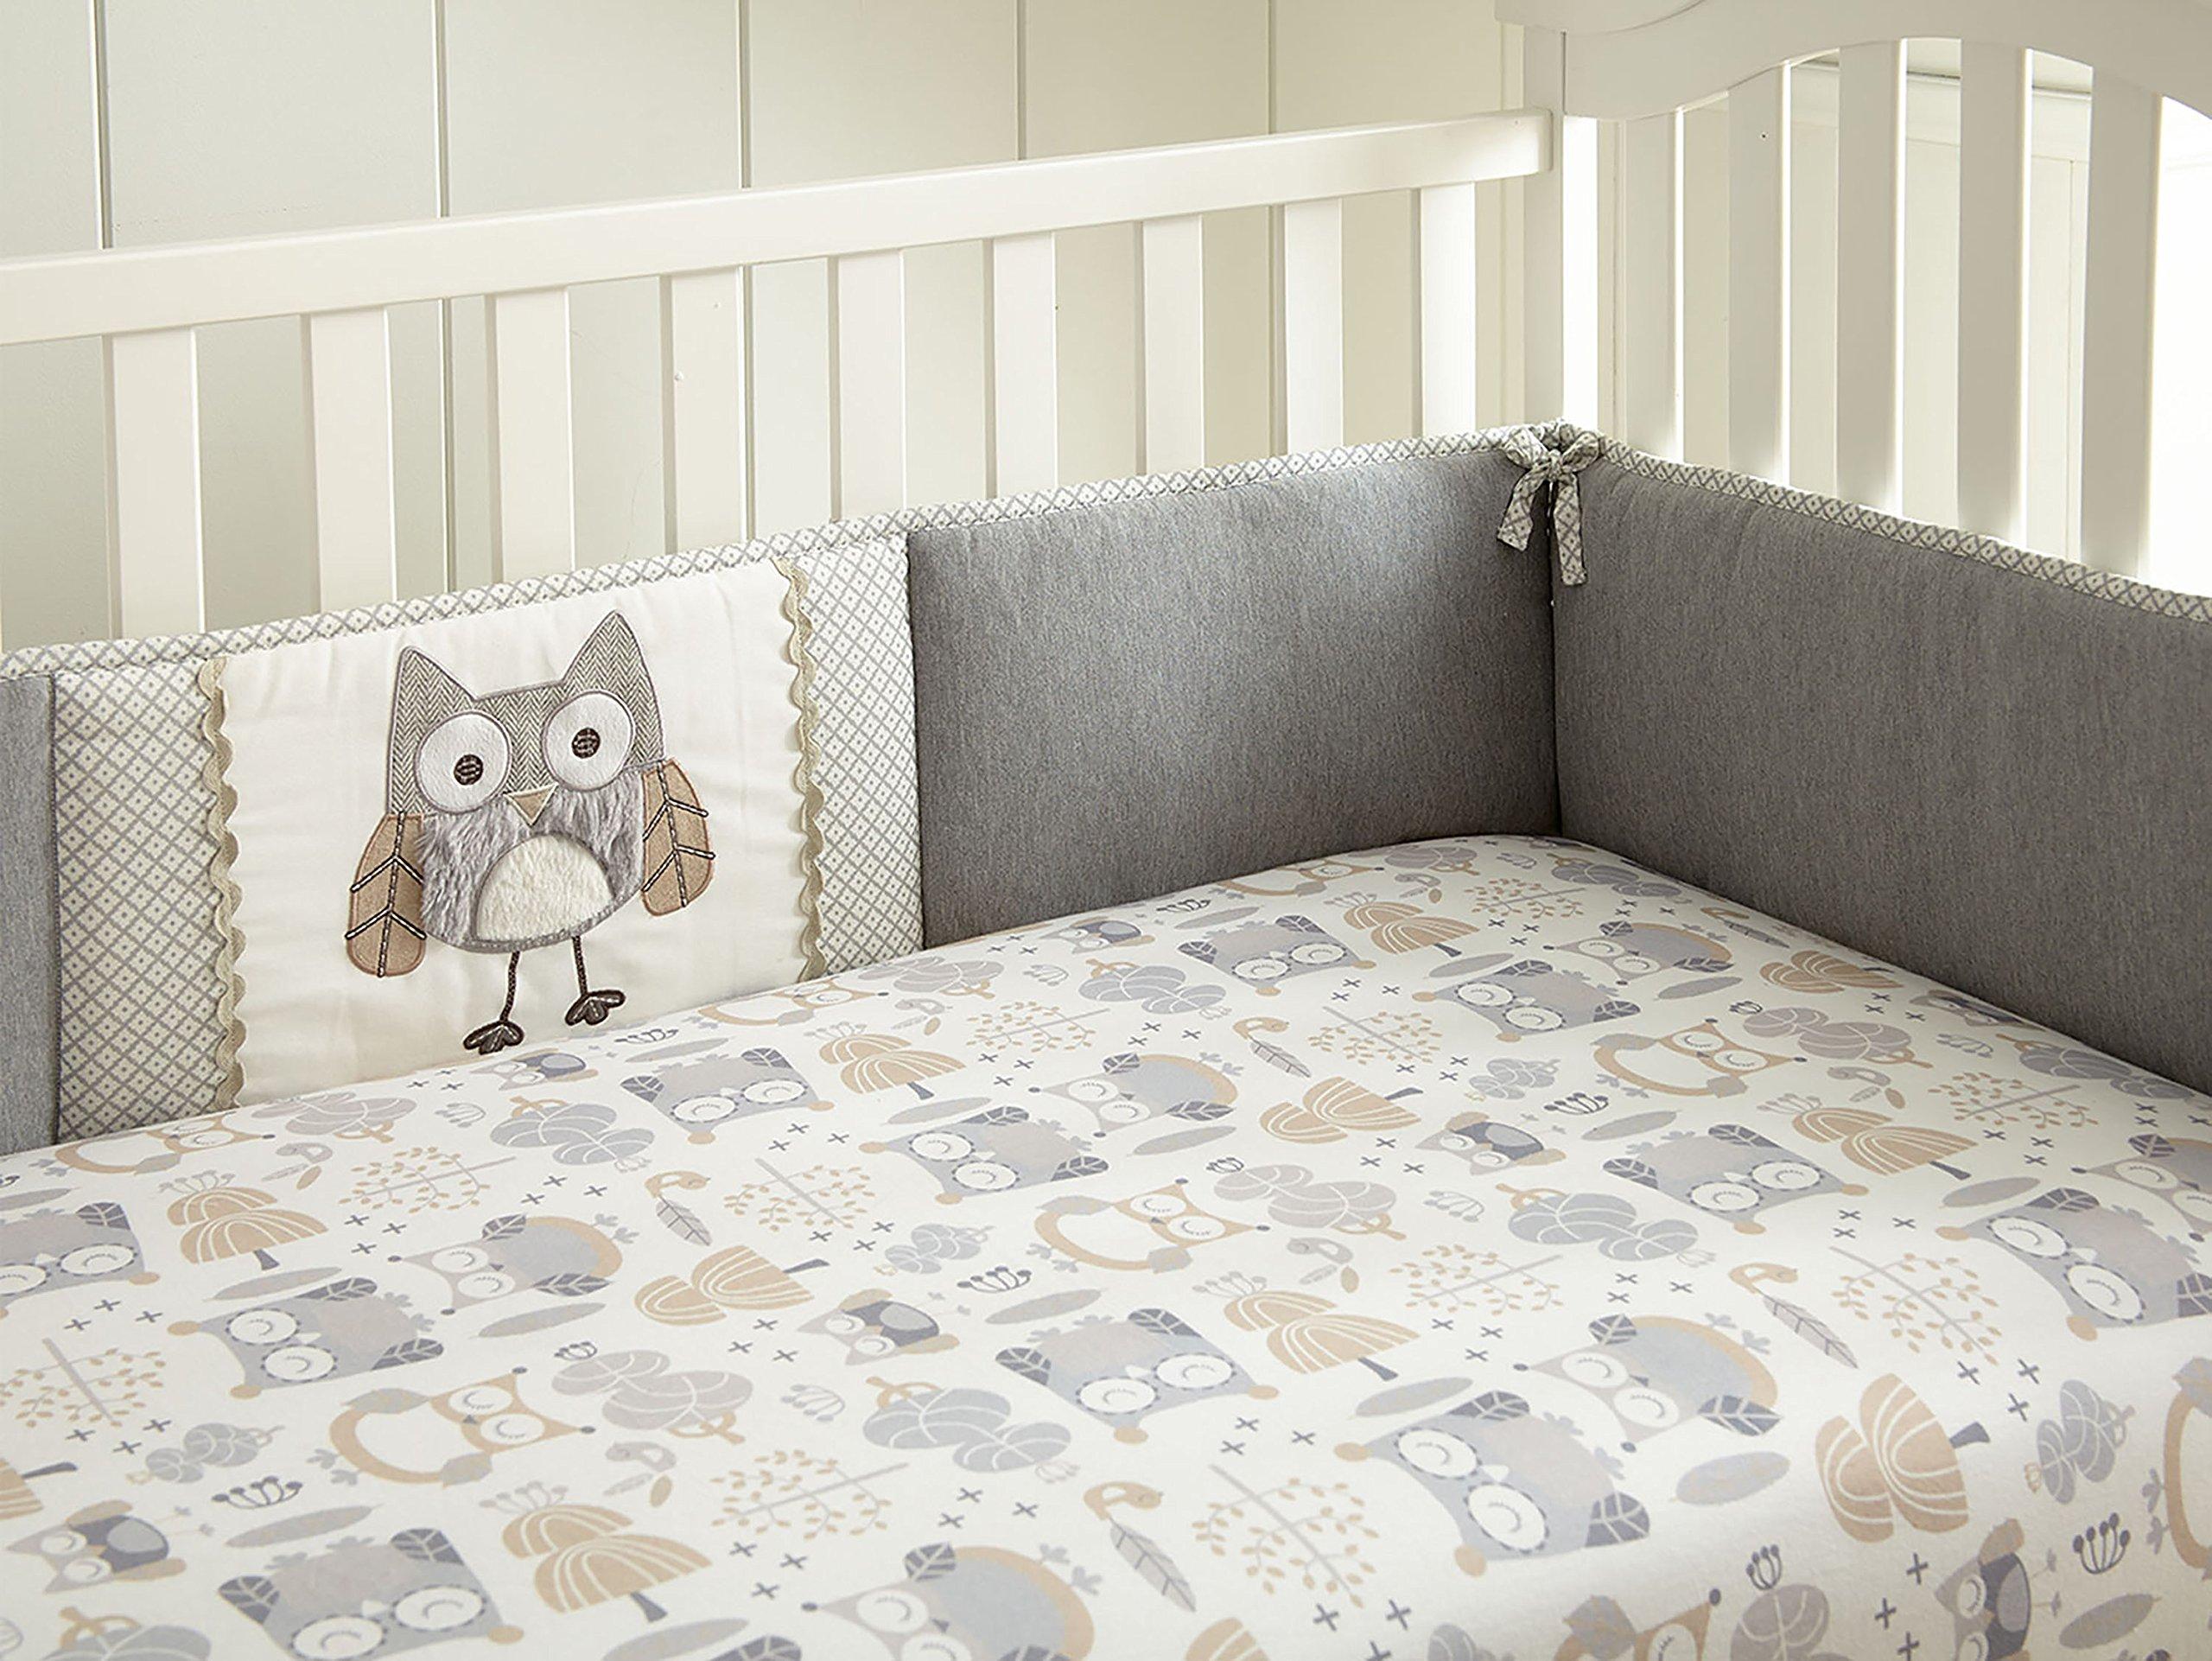 pom sets shop pompomplay lab set waverly play bedding trend myclassycrib piece crib